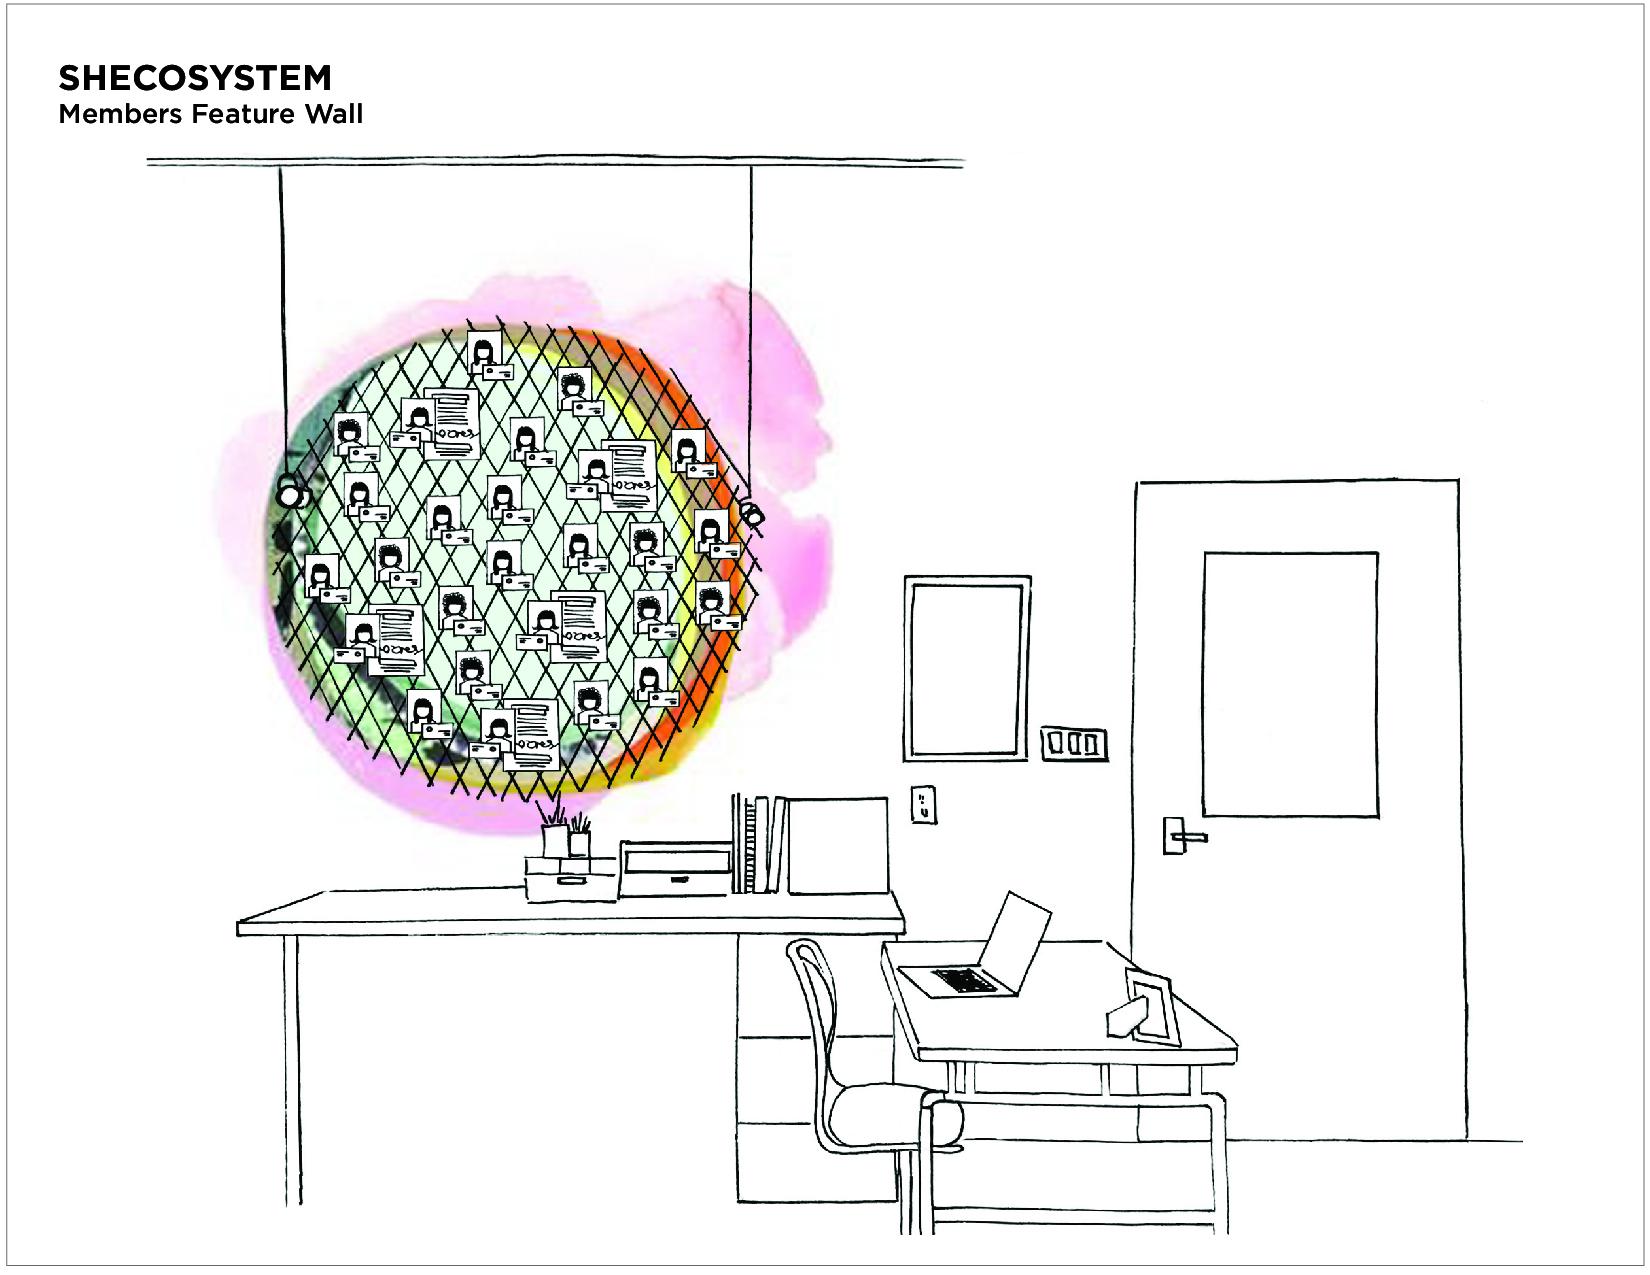 Shecosystem_MembersFeatureWall art-01.jpg